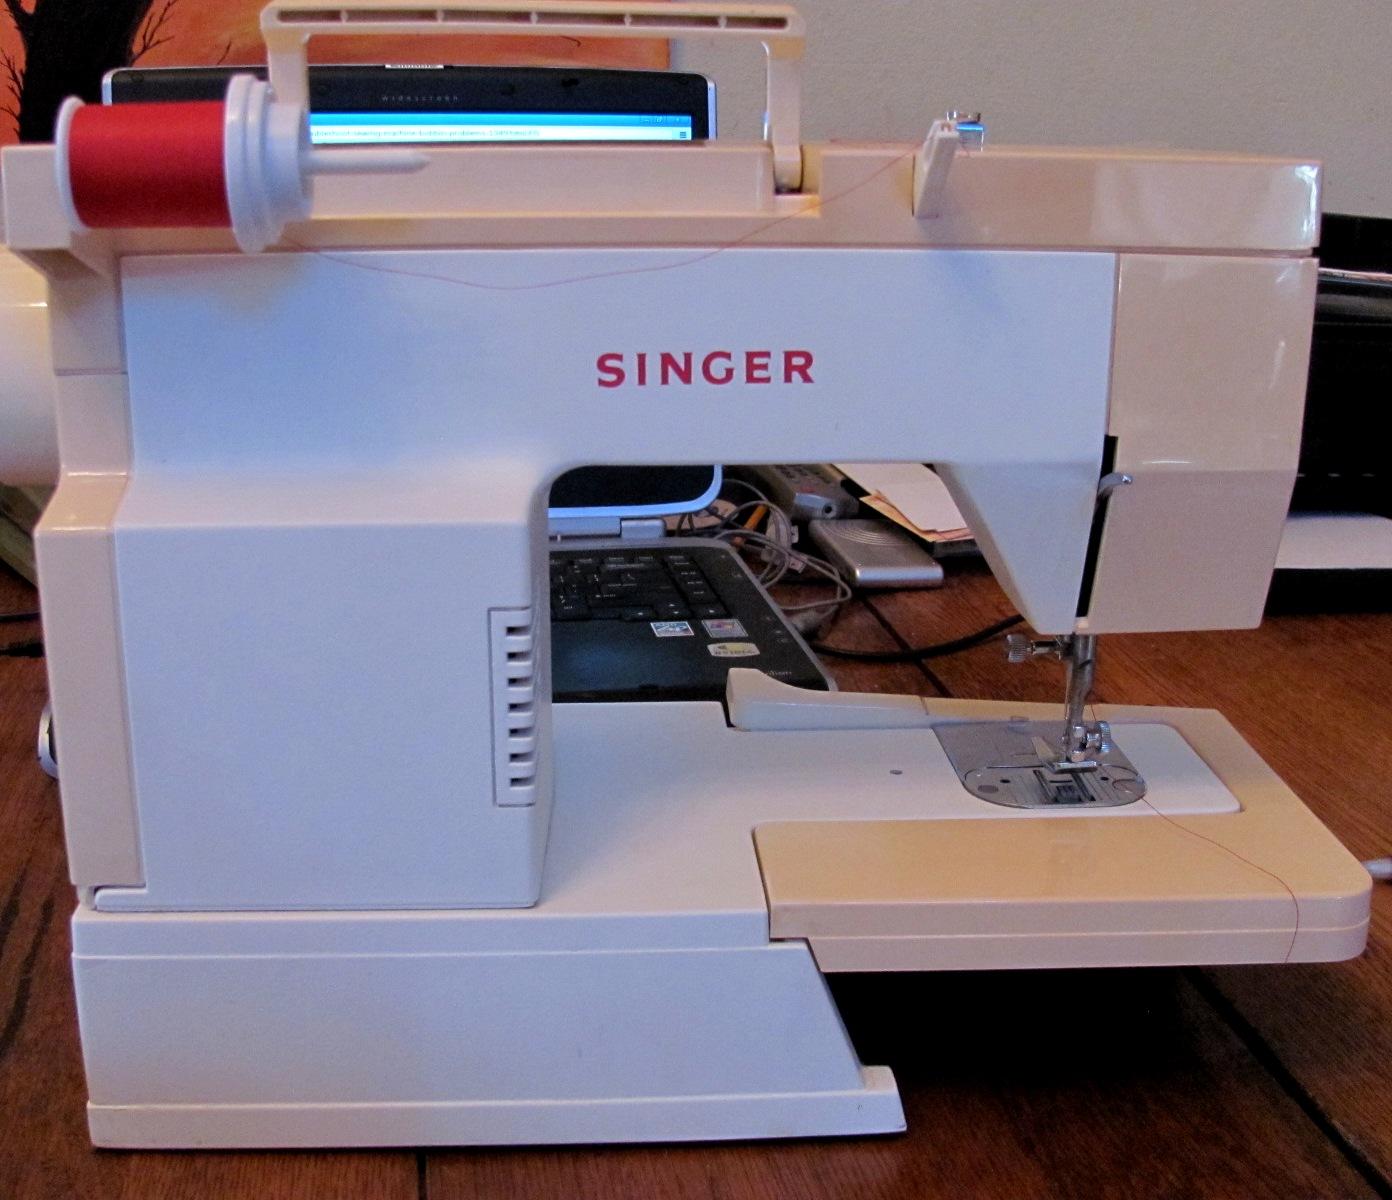 the sewing machine rescue singer 5808c rh sewingmachinerescue blogspot com singer model 5808c manual singer sewing machine 5808c manual